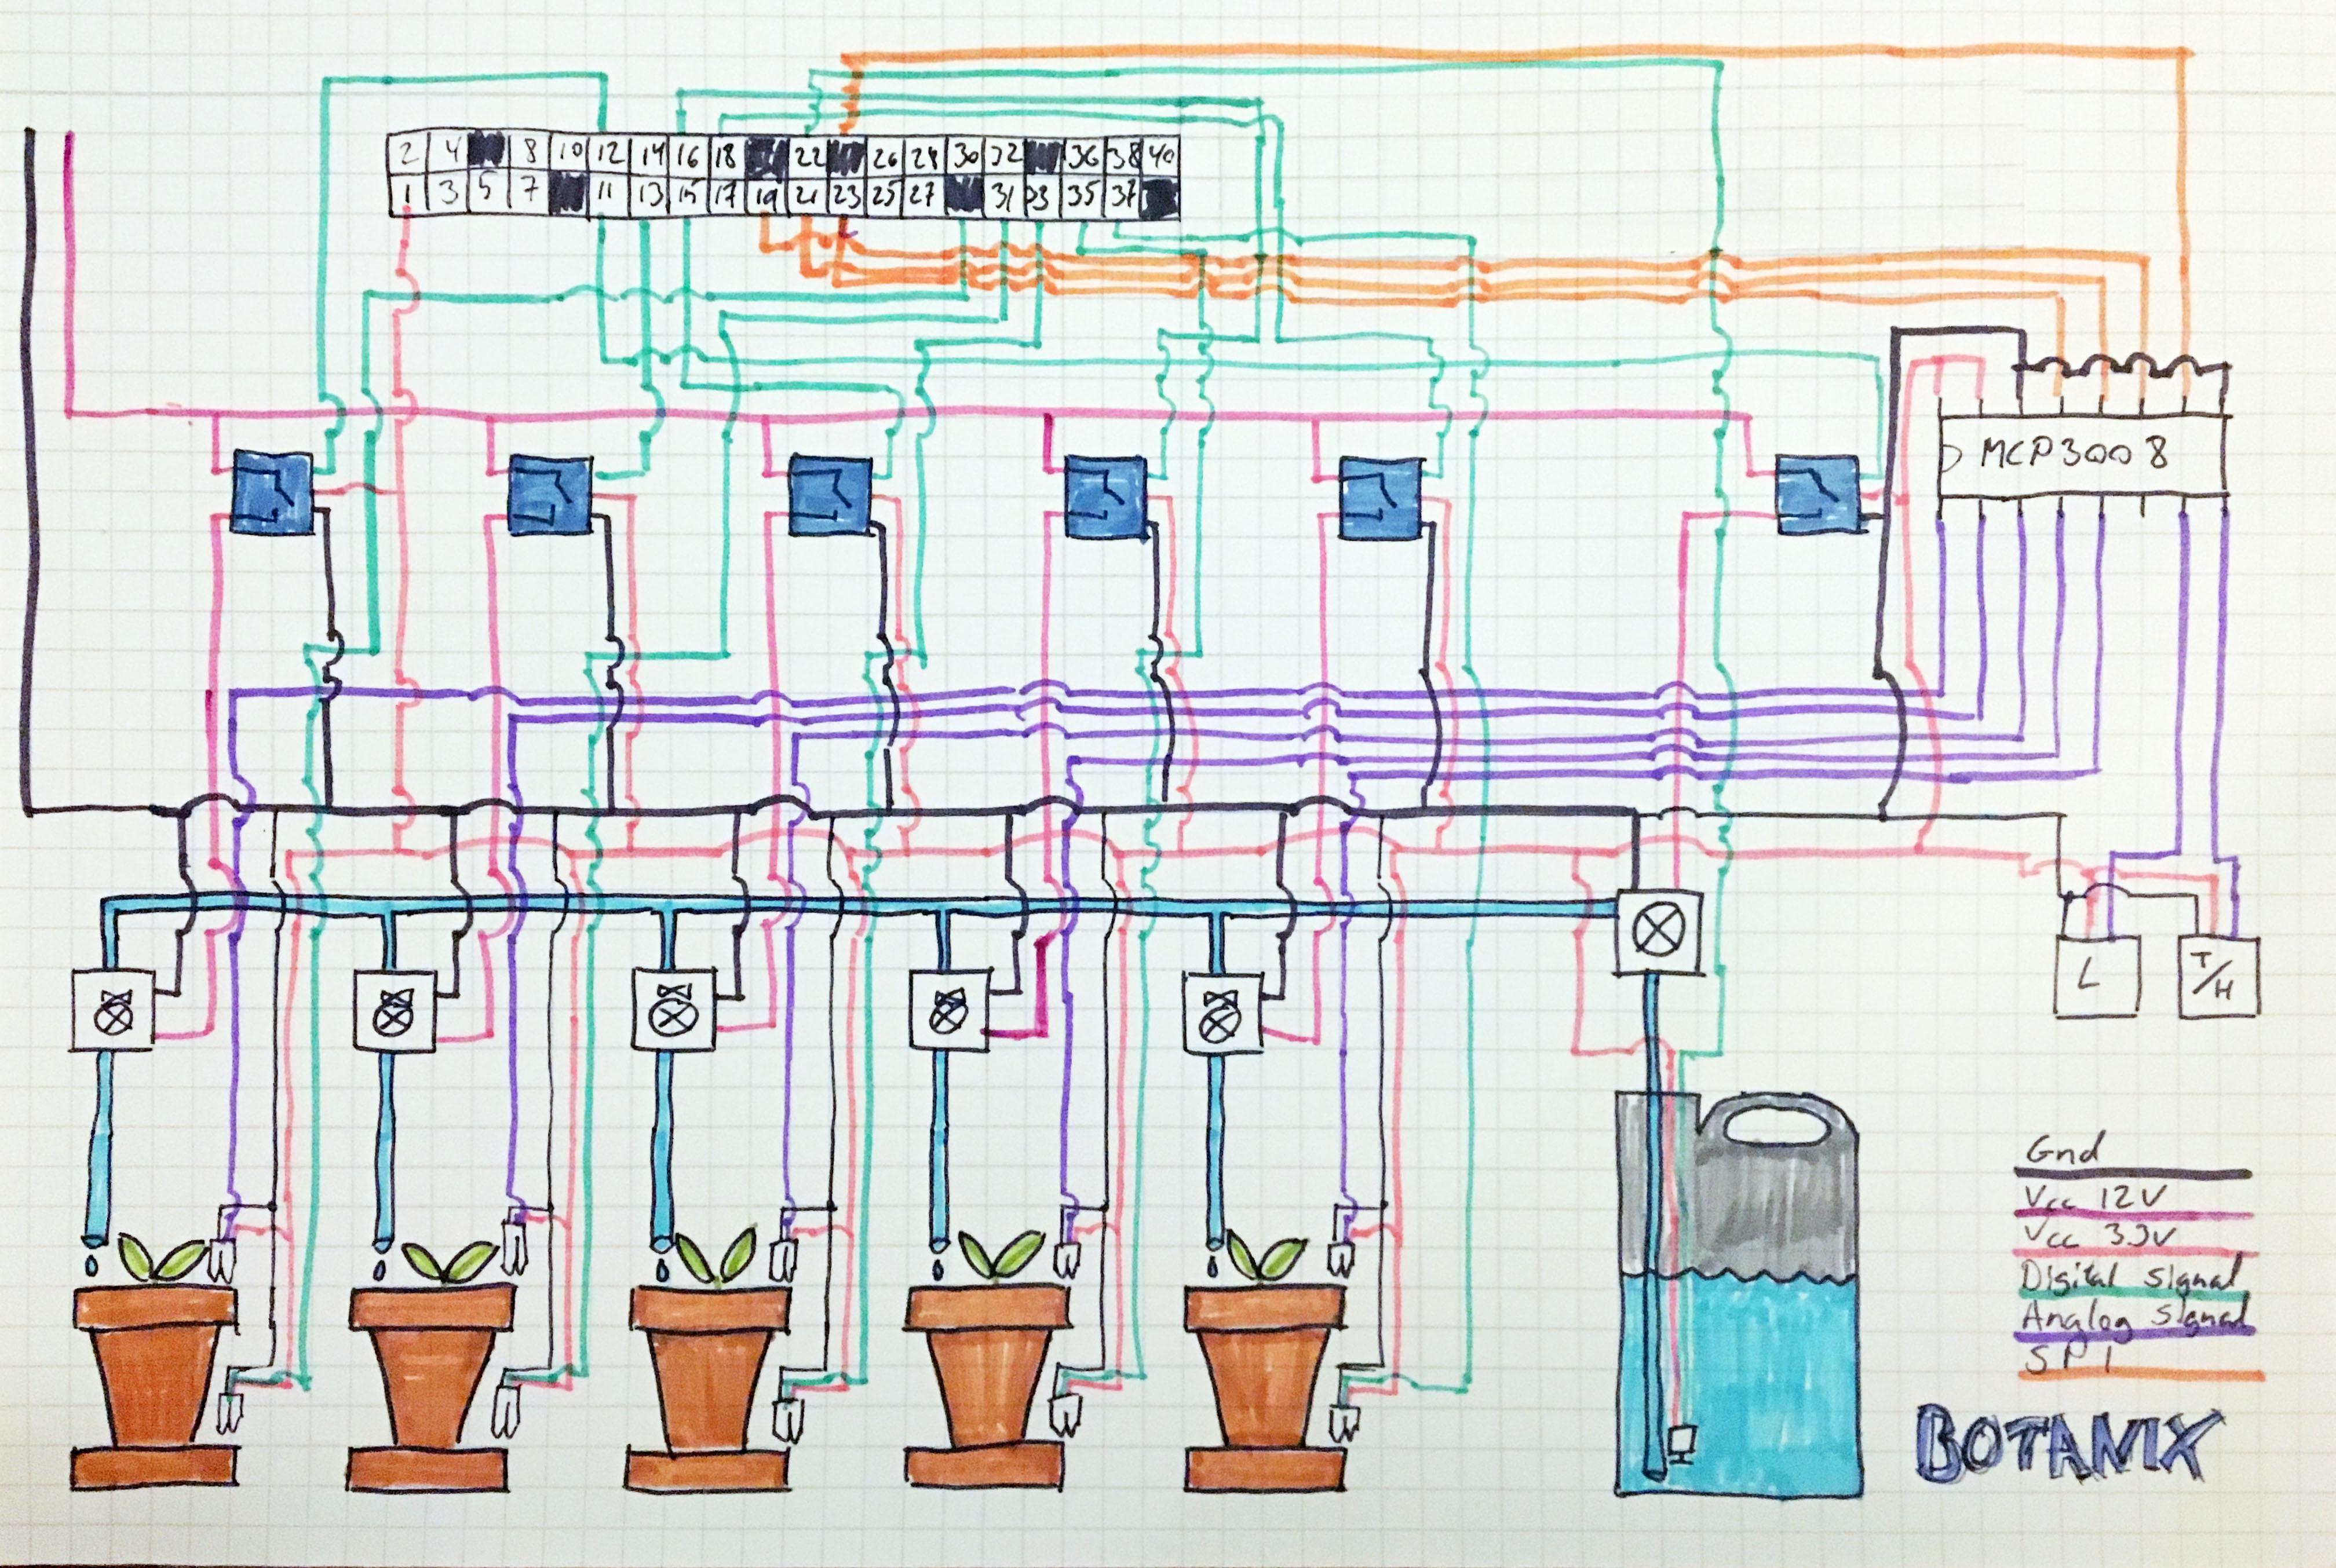 Botanix Hardware Overview